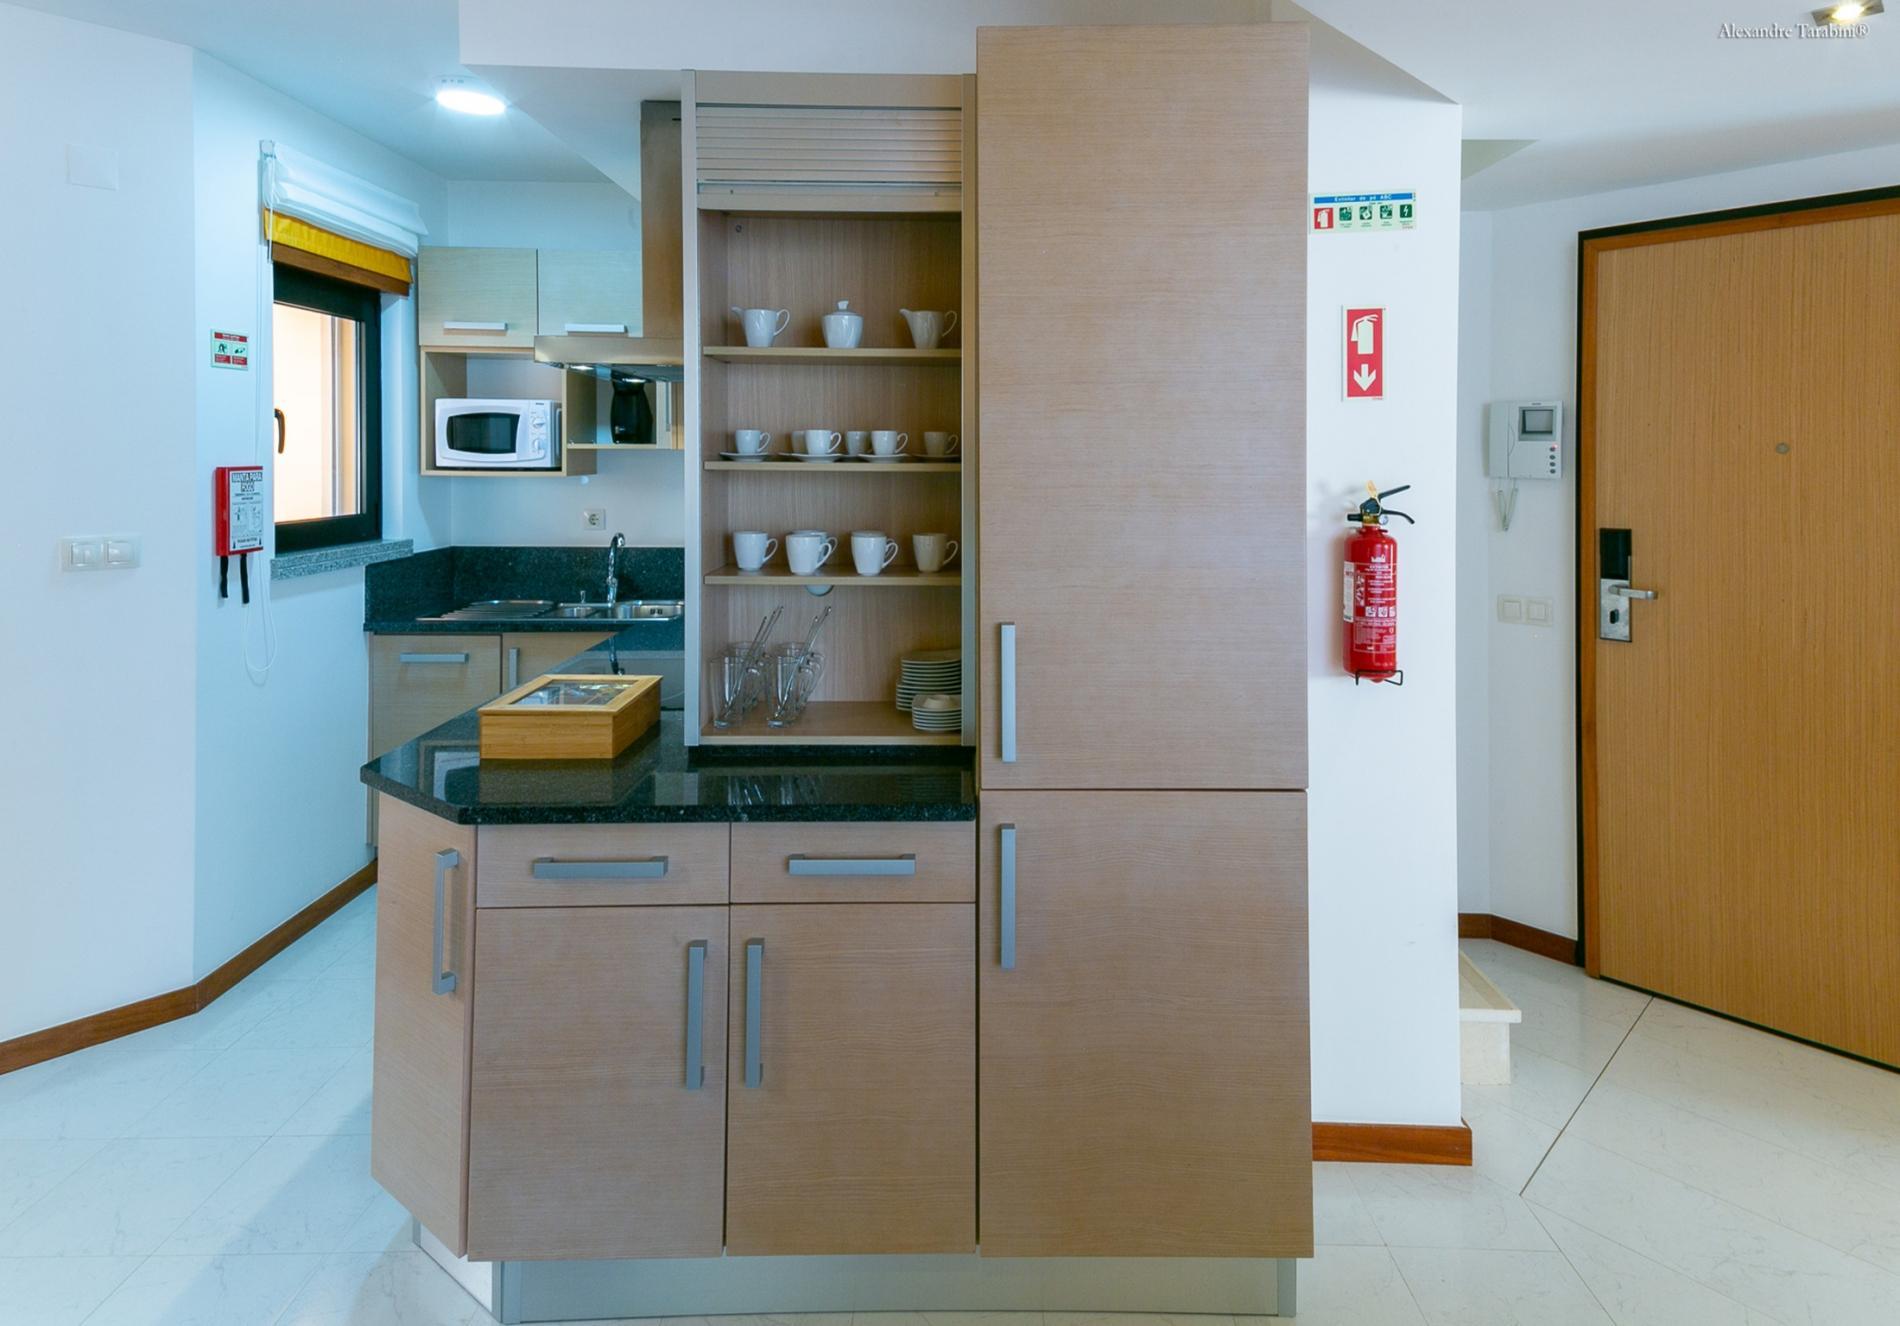 Ferienwohnung B29 - LuzBay Duplex (2558092), Luz, , Algarve, Portugal, Bild 8